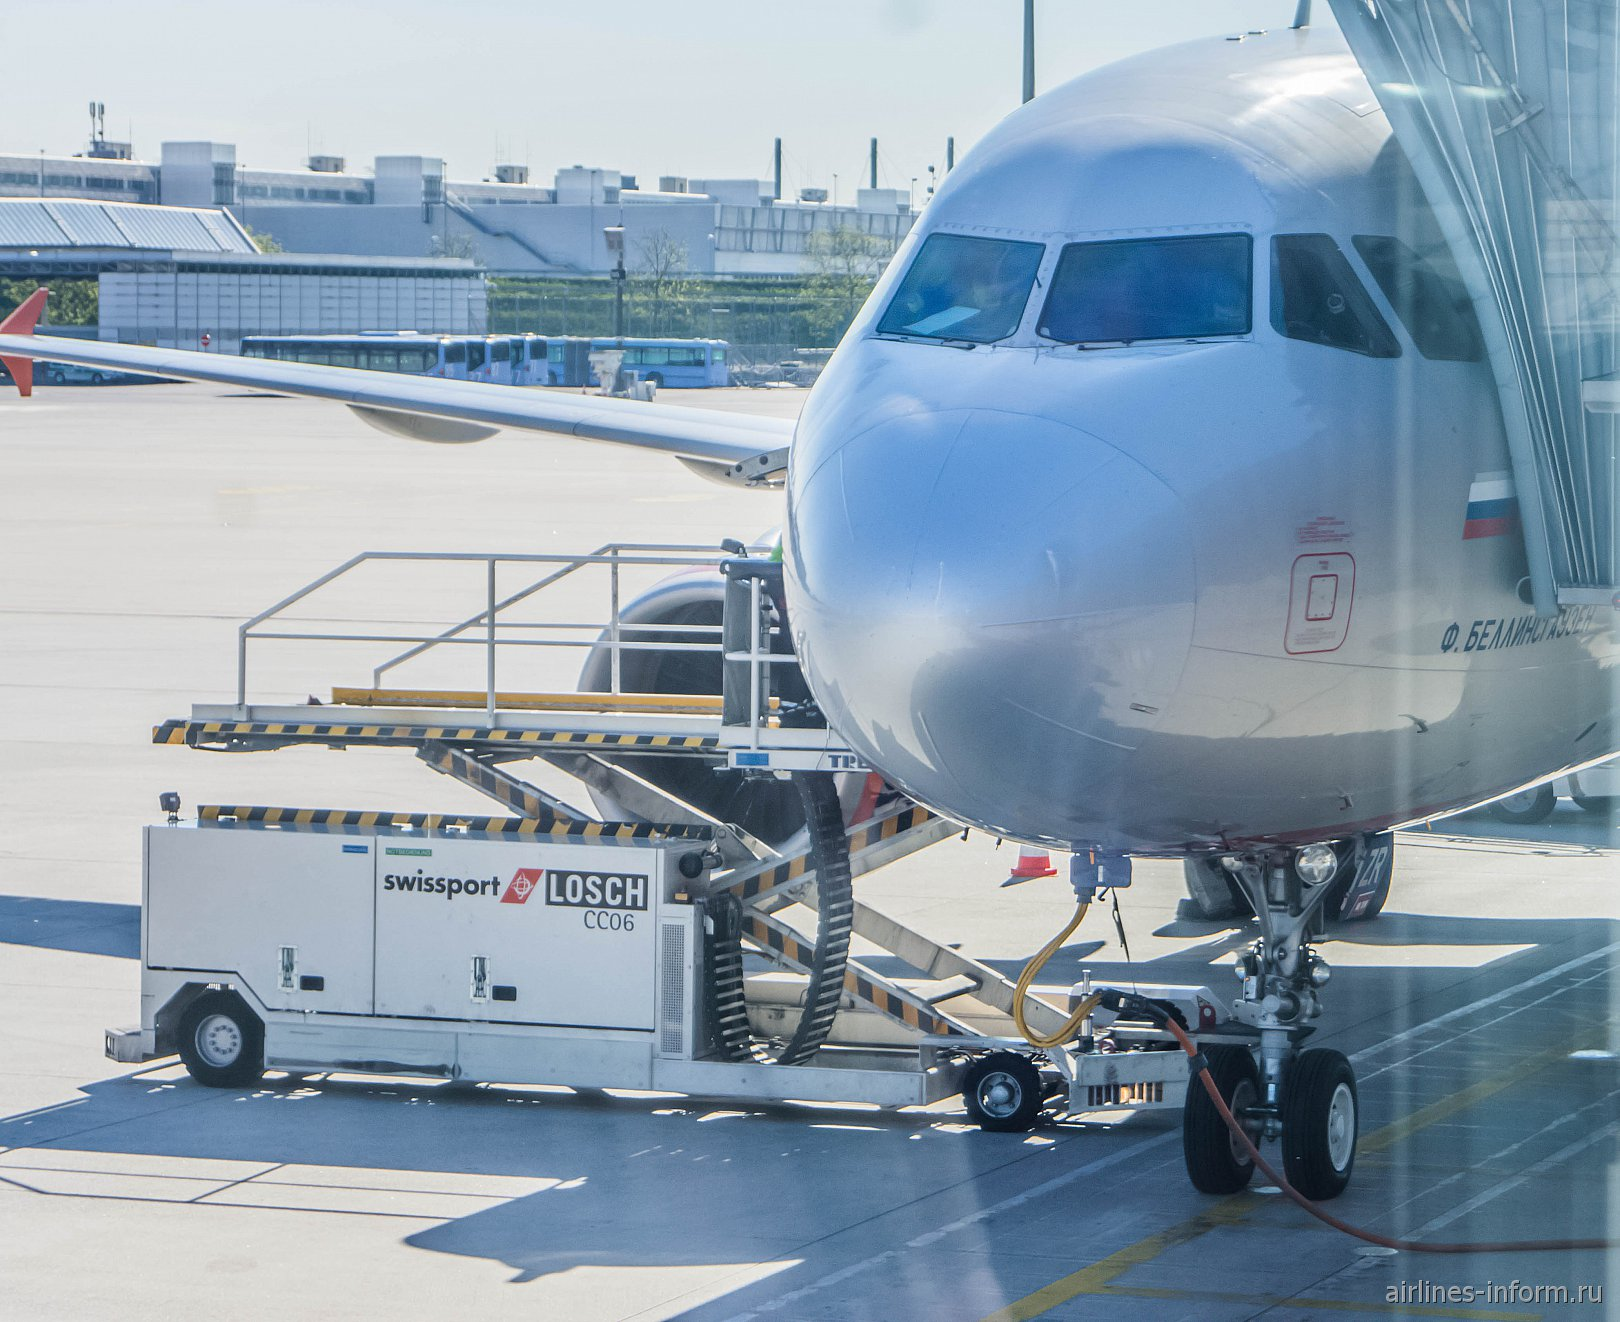 Munich - Moscow SU2327 Aeroflot